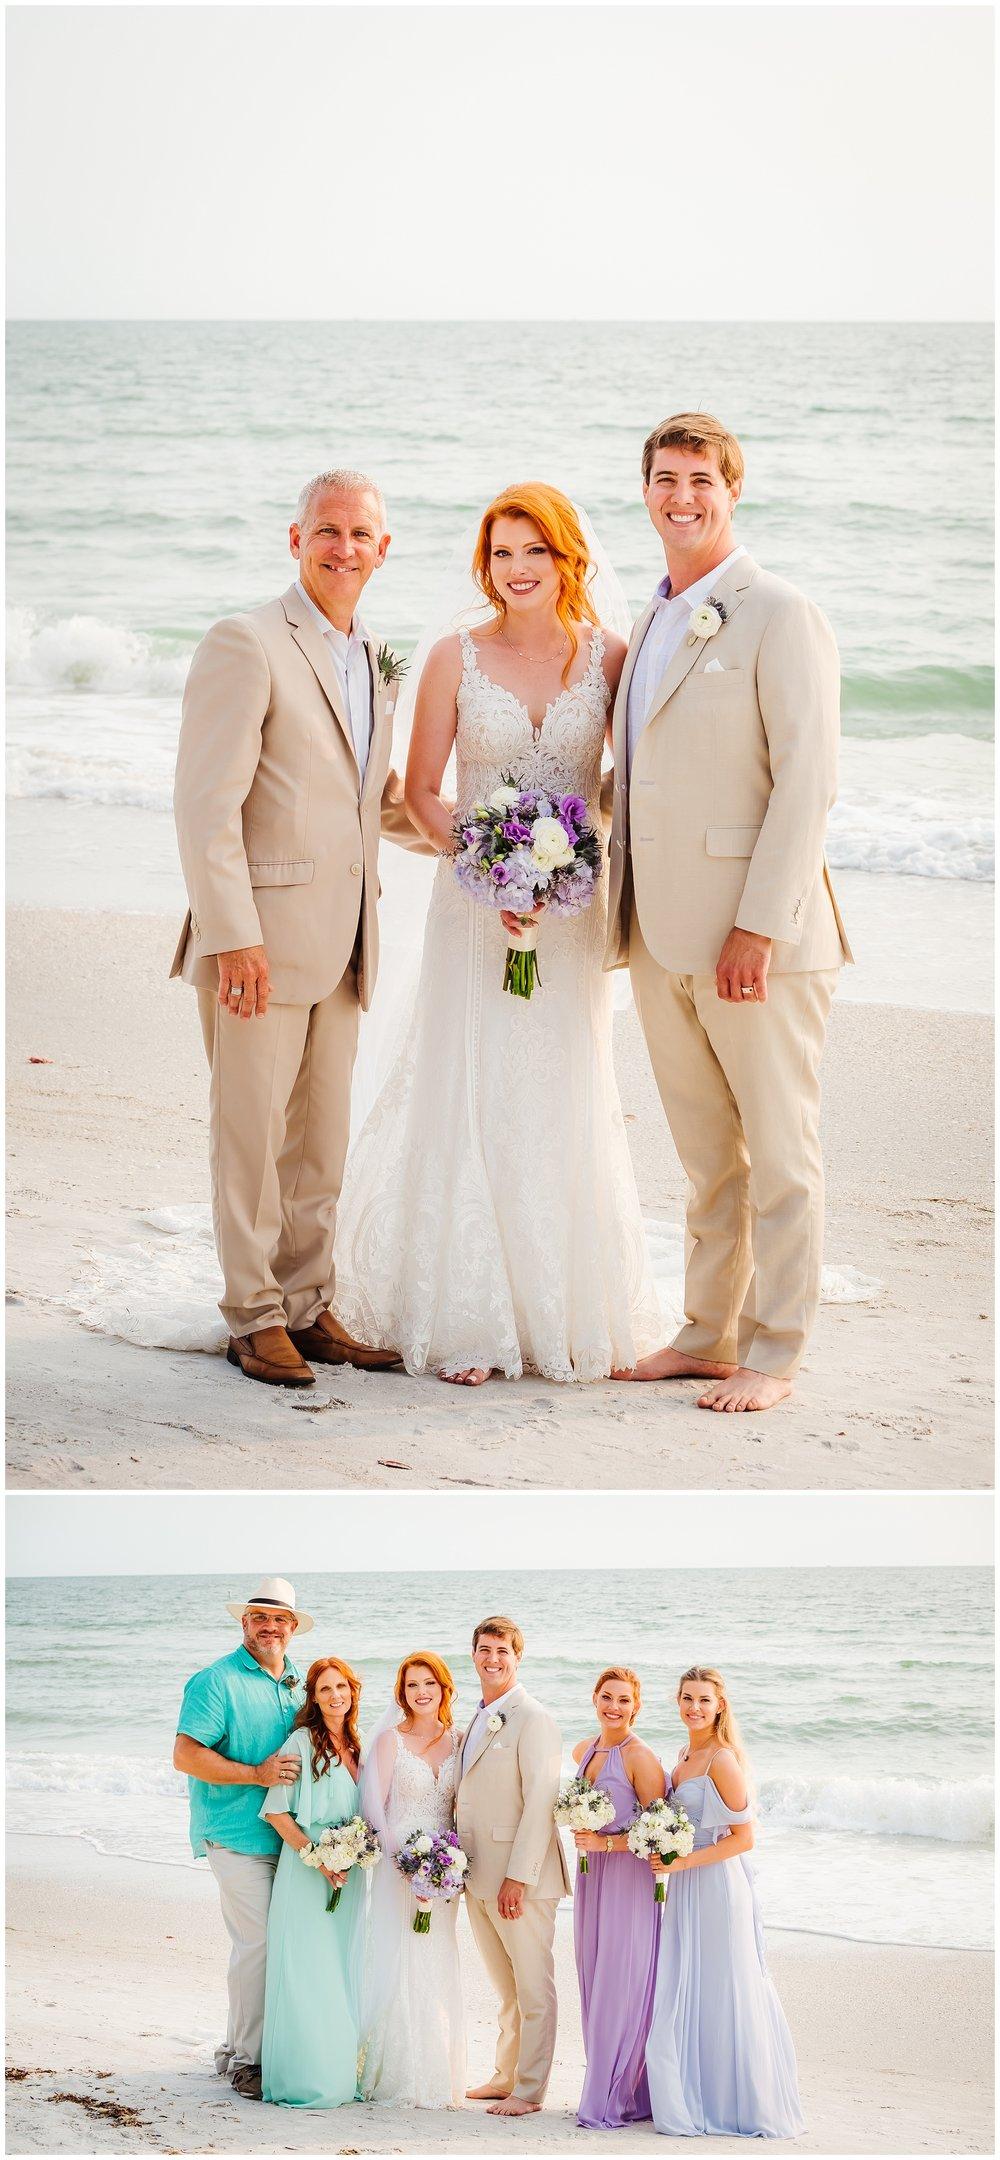 tampa-st-pete-wedding-photographer-indian-rocks-beach-mermaid-train-redhead_0142.jpg